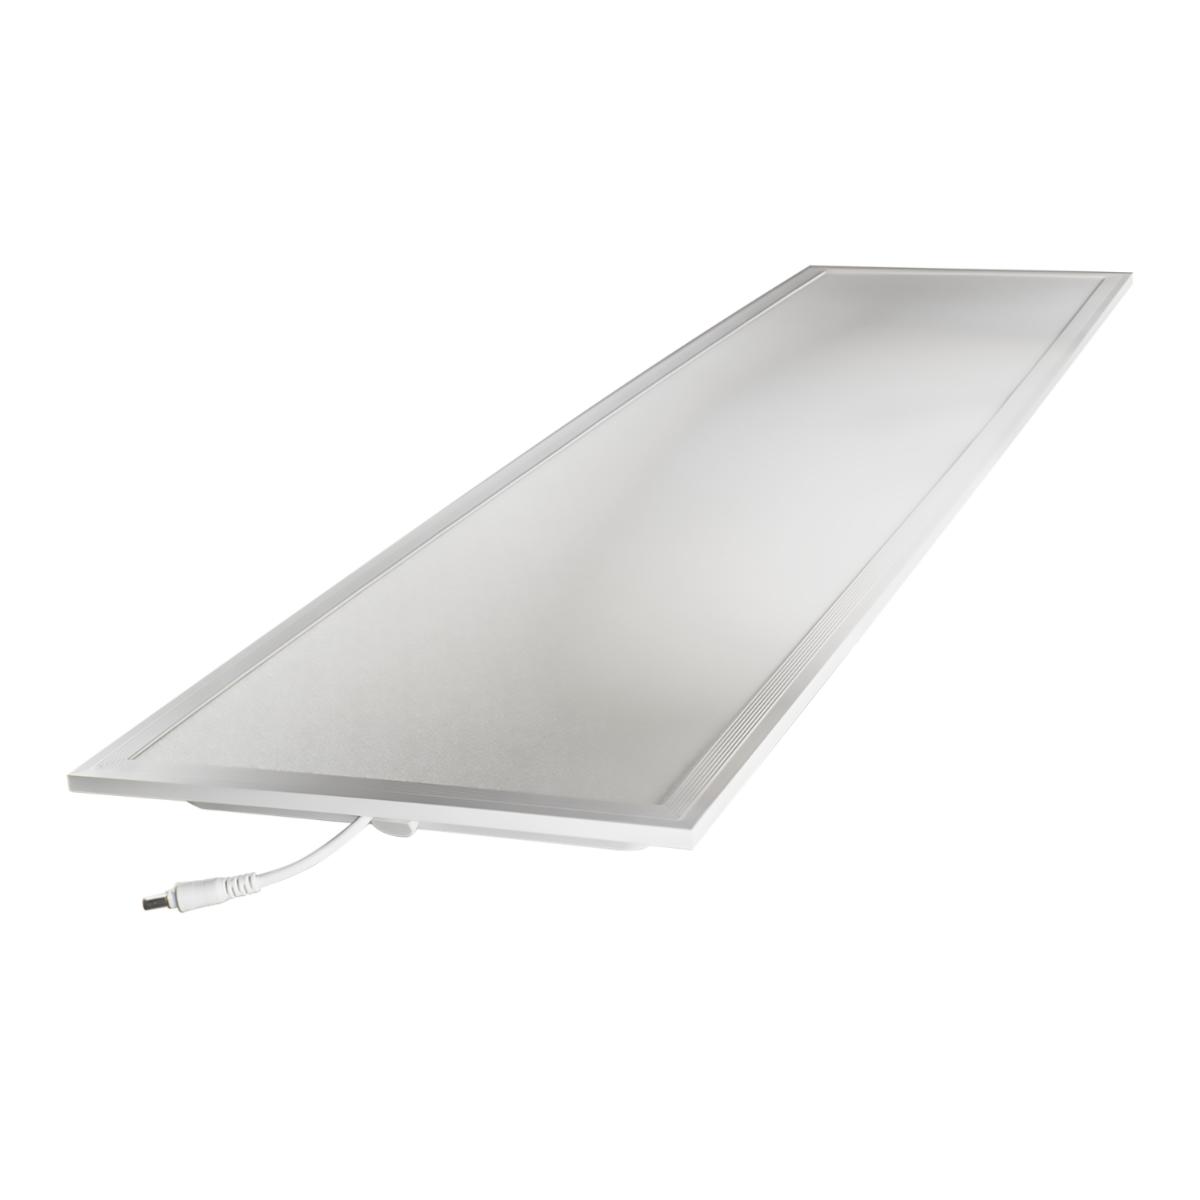 Noxion Panneau LED Delta Pro Highlum V2.0 Xitanium DALI 40W 30x120cm 3000K 5280lm UGR <19 | Dali Dimmable - Blanc Chaud - Substitut 2x36W